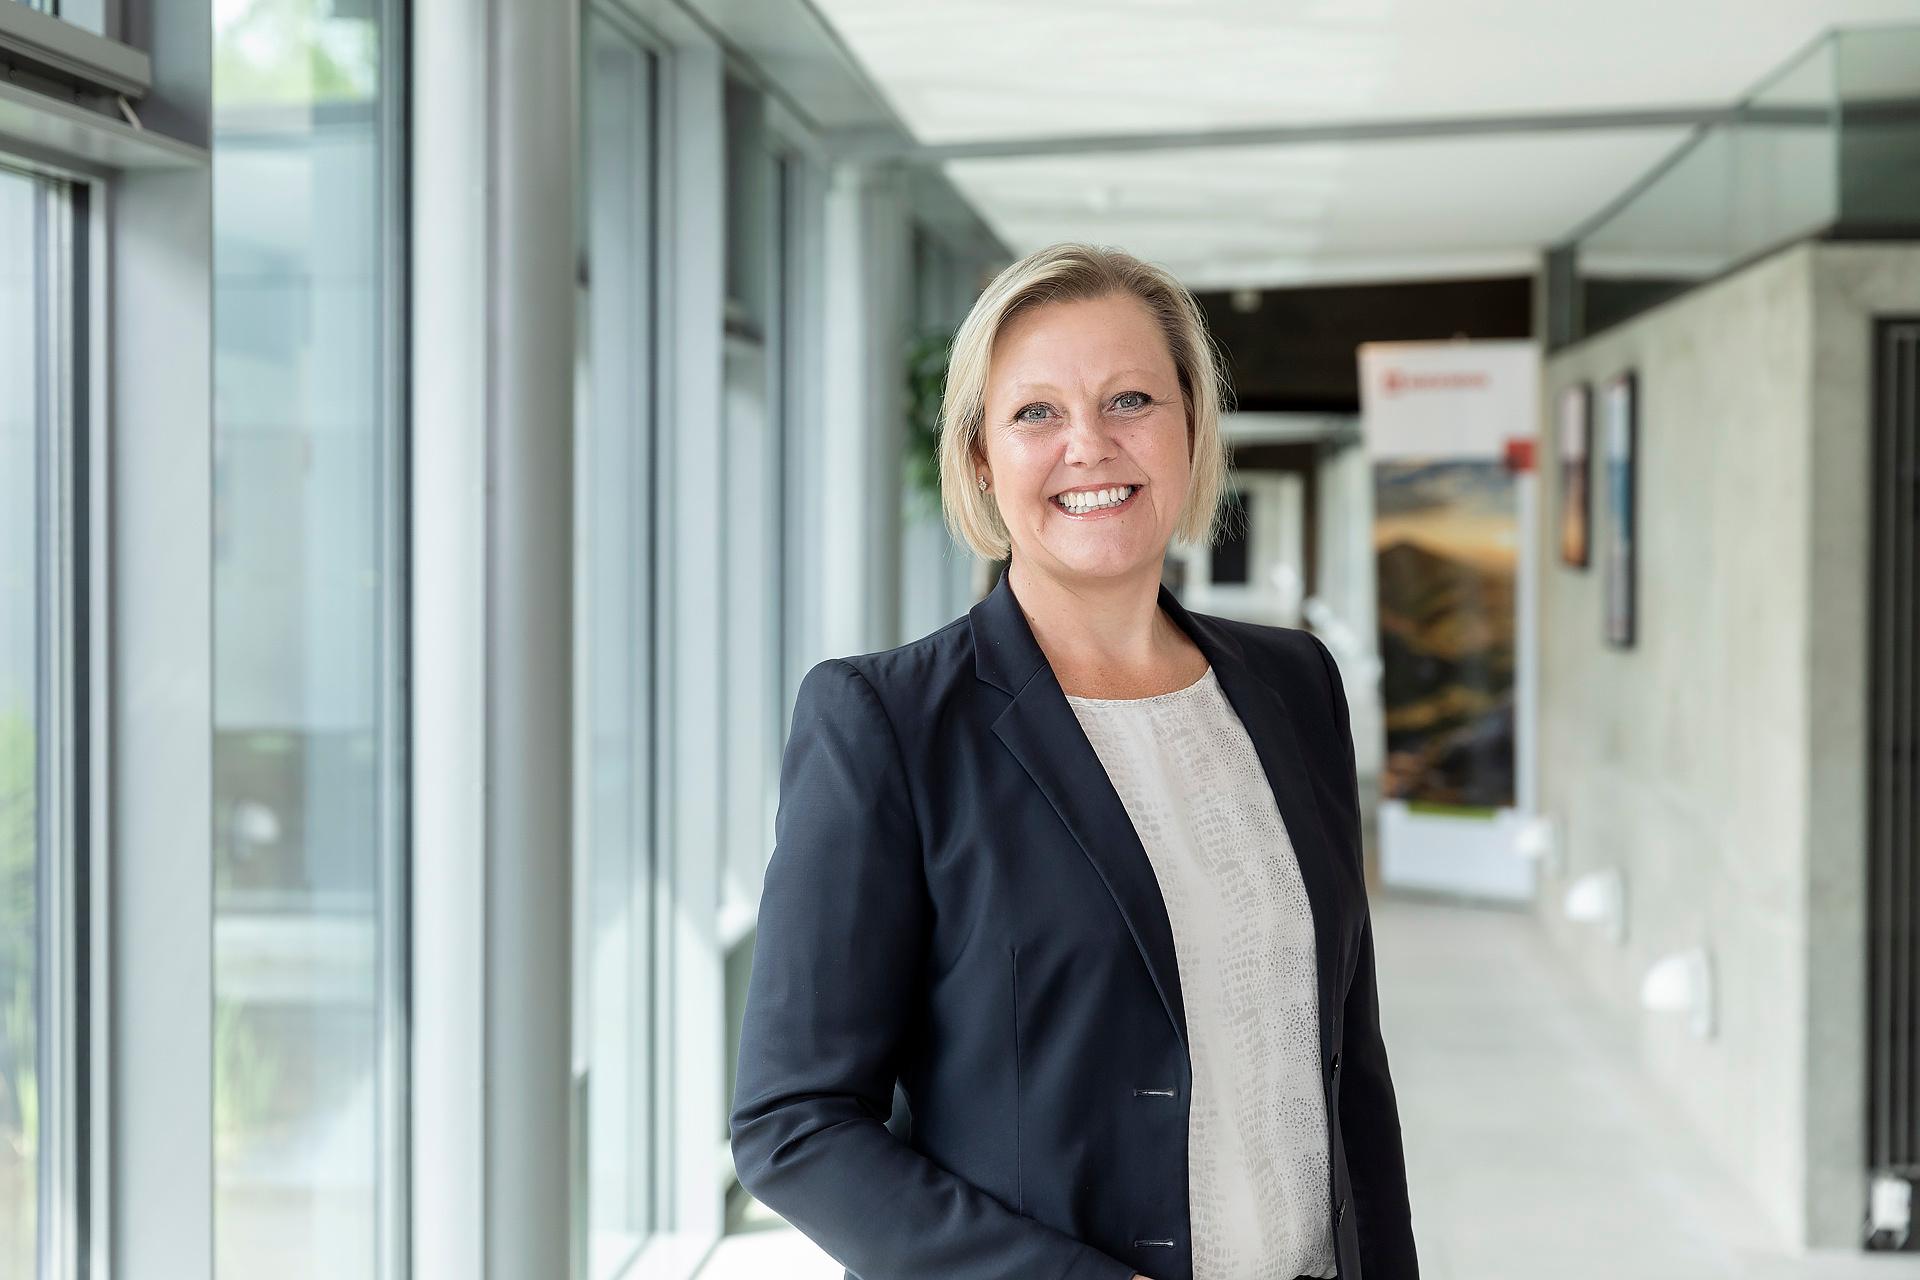 Forretningsdirektør Nina Dencker Nielsen fylder 50 år